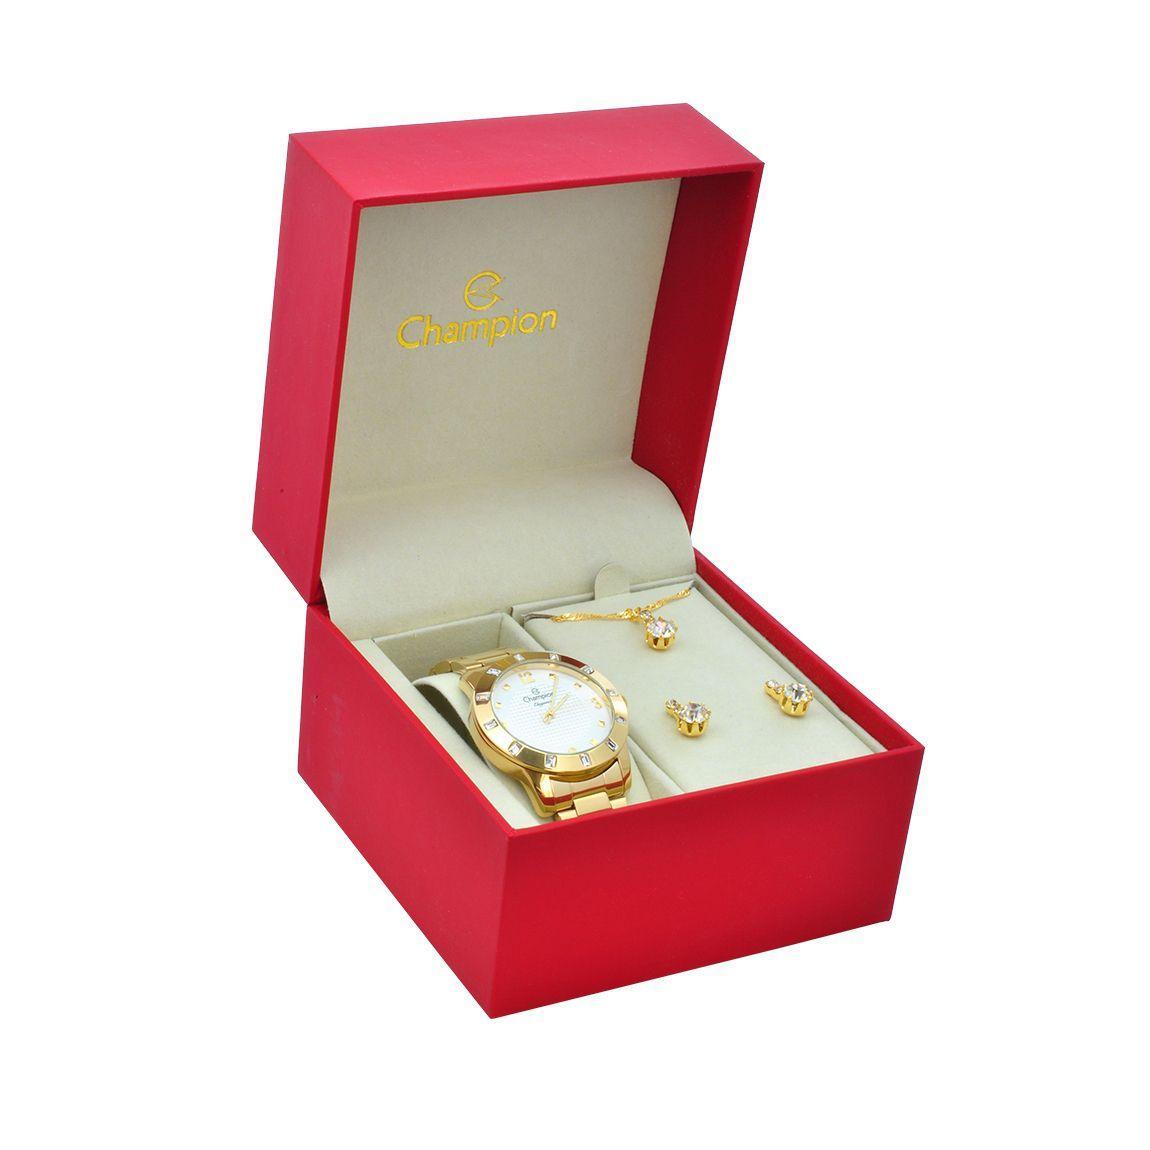 f36753fd7be Relógio de Pulso Champion Feminino Kit com Brinco e Corrente CN27312W -  Dourado - Champion watch R  204